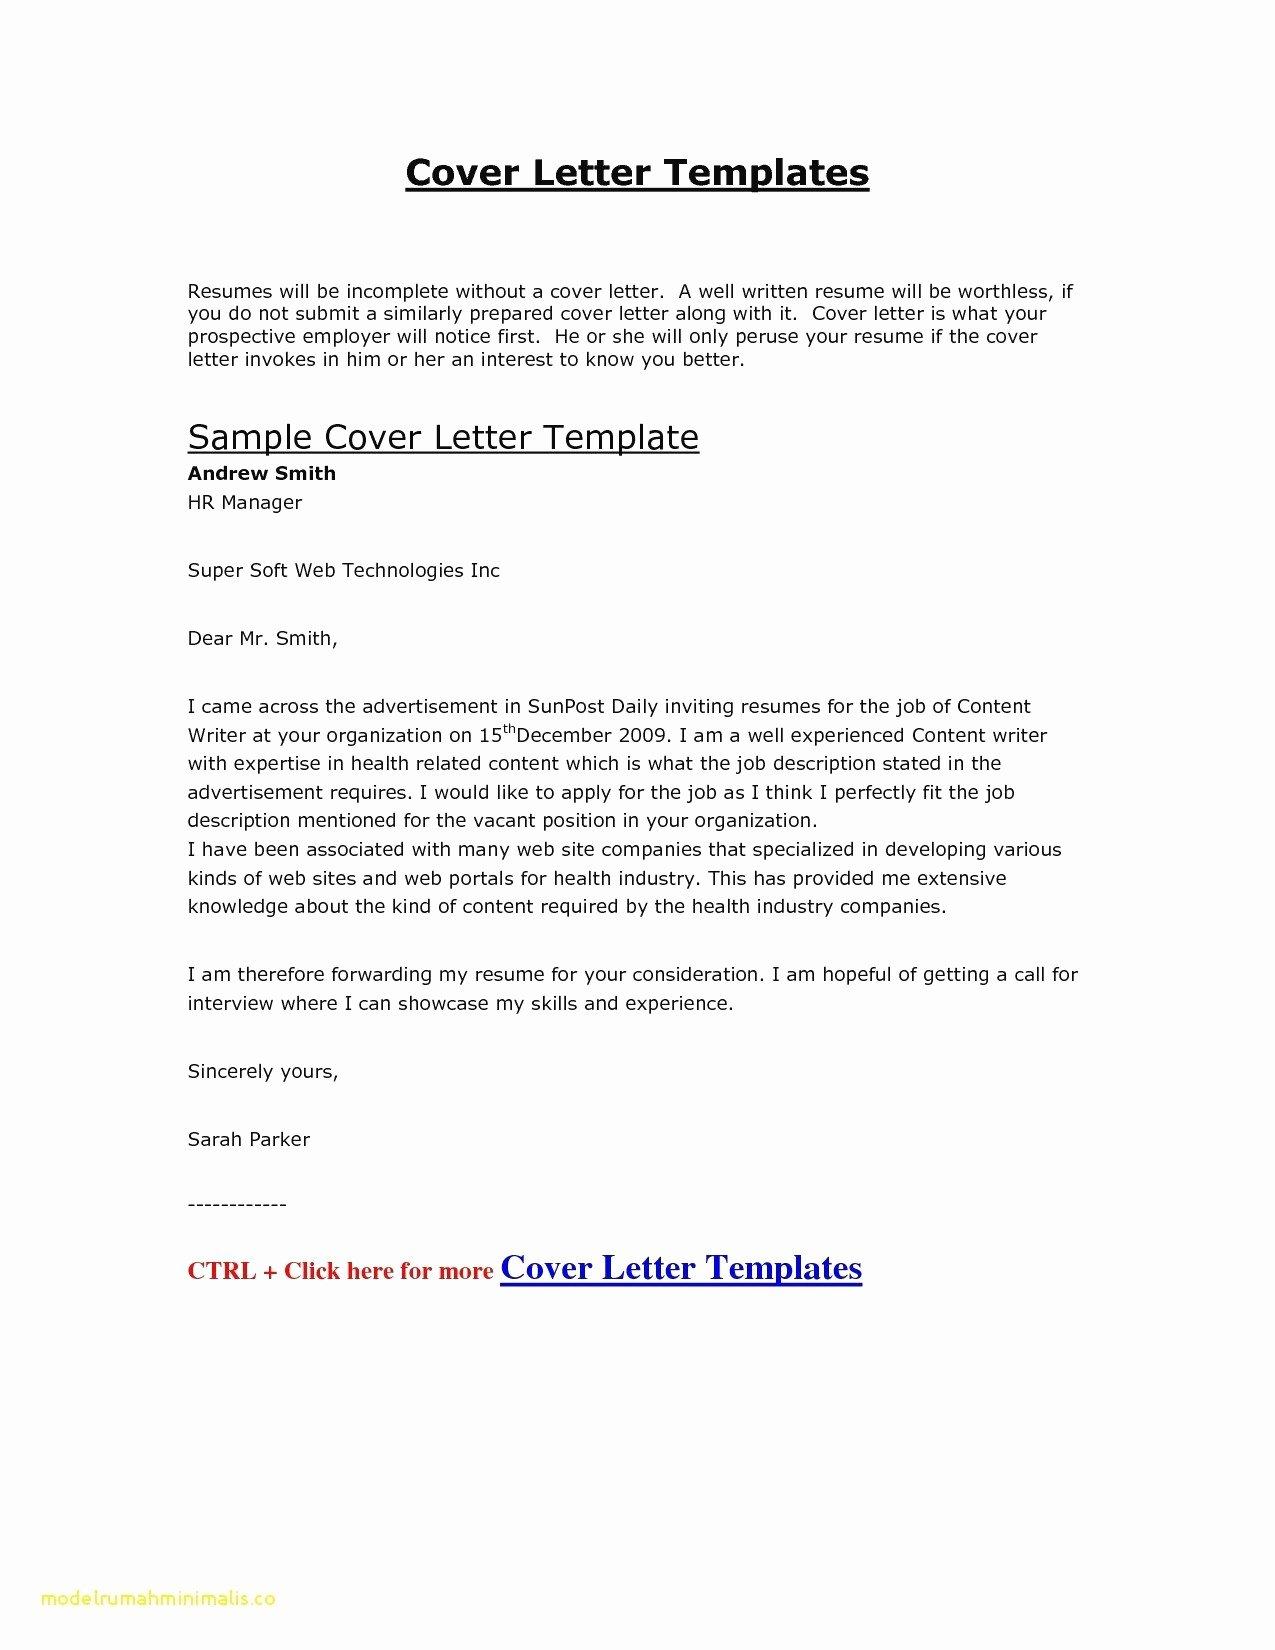 Cover Letter format Google Docs Elegant Google Docs Christmas Letter Template Bluemooncatering